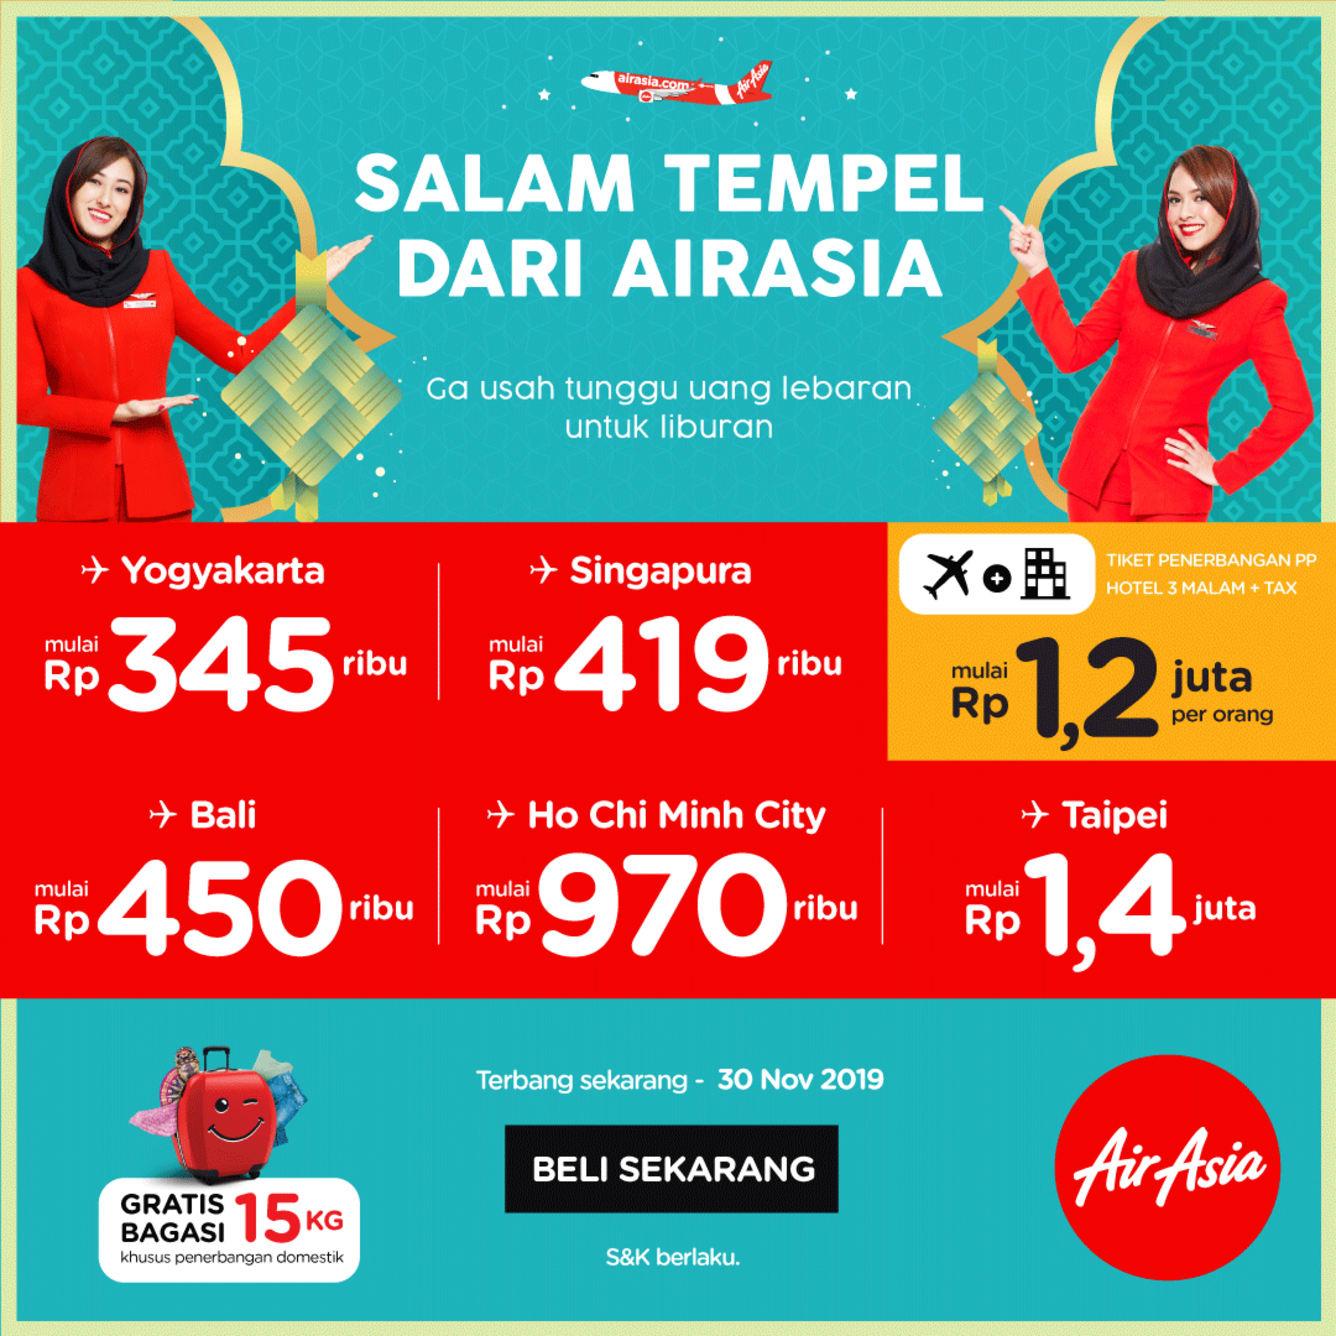 week 21 - Promo Air Asia